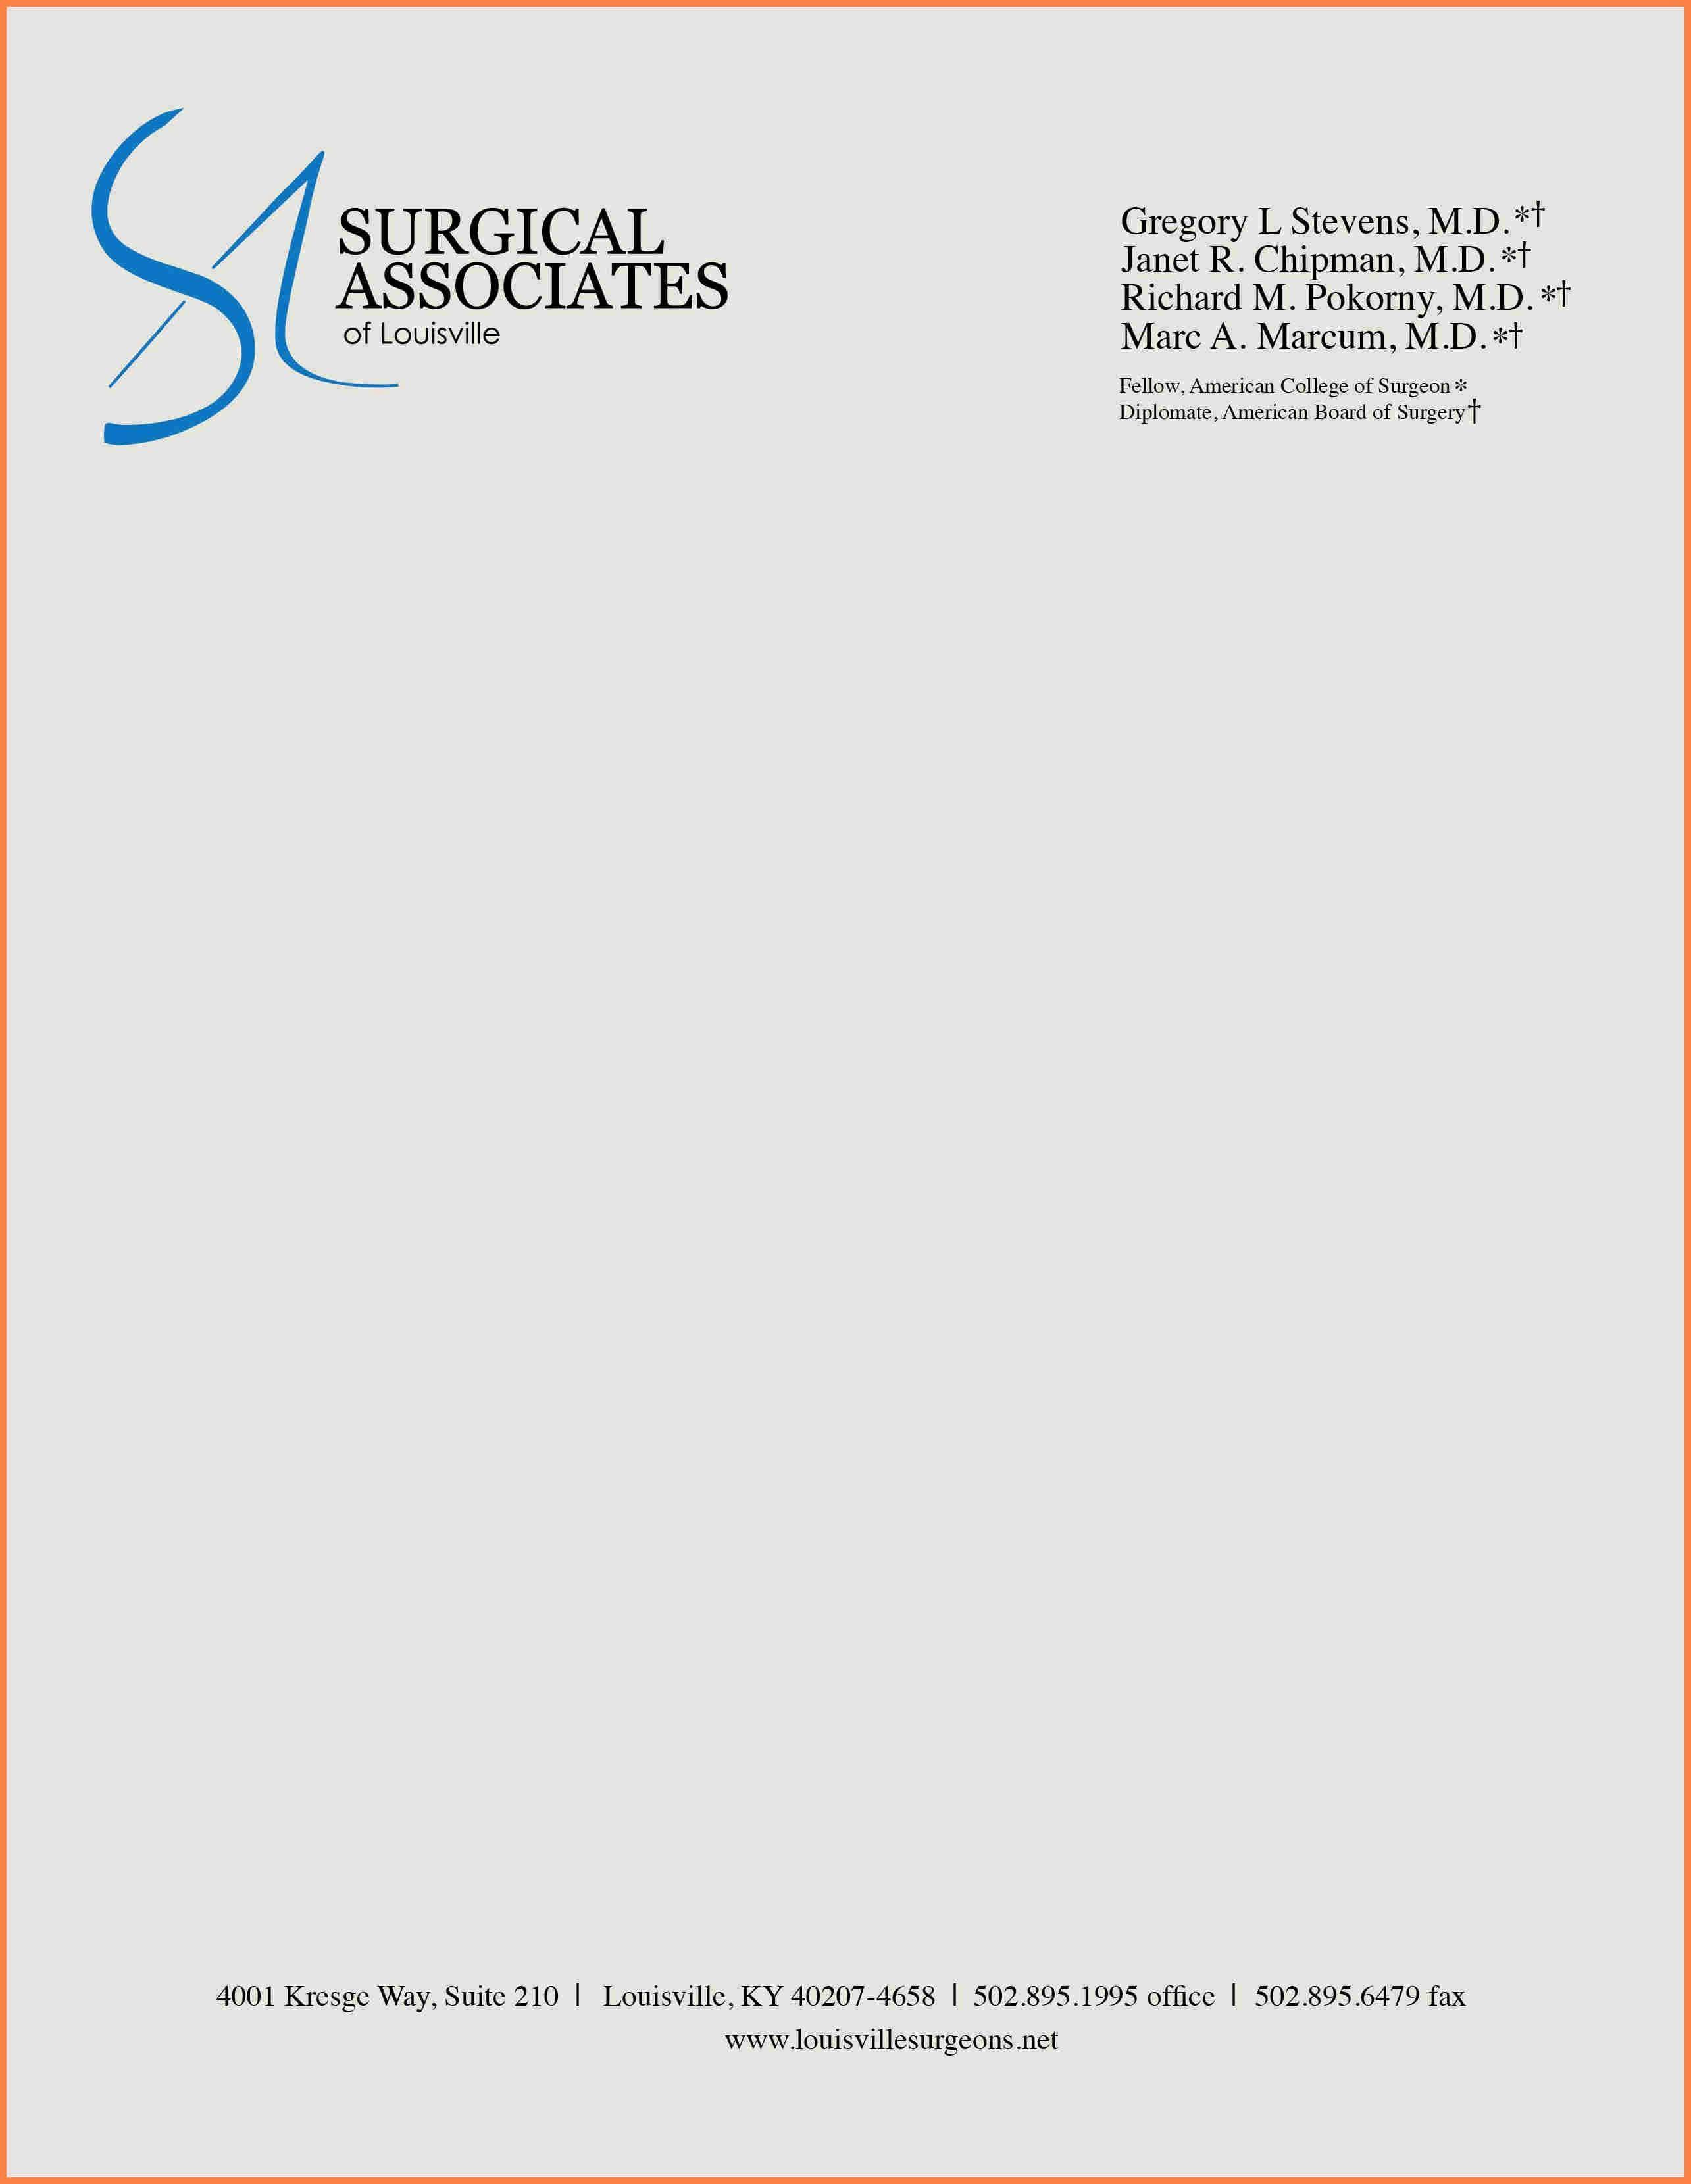 002 Amazing Letterhead Format In Word Free Download Pdf Idea Full